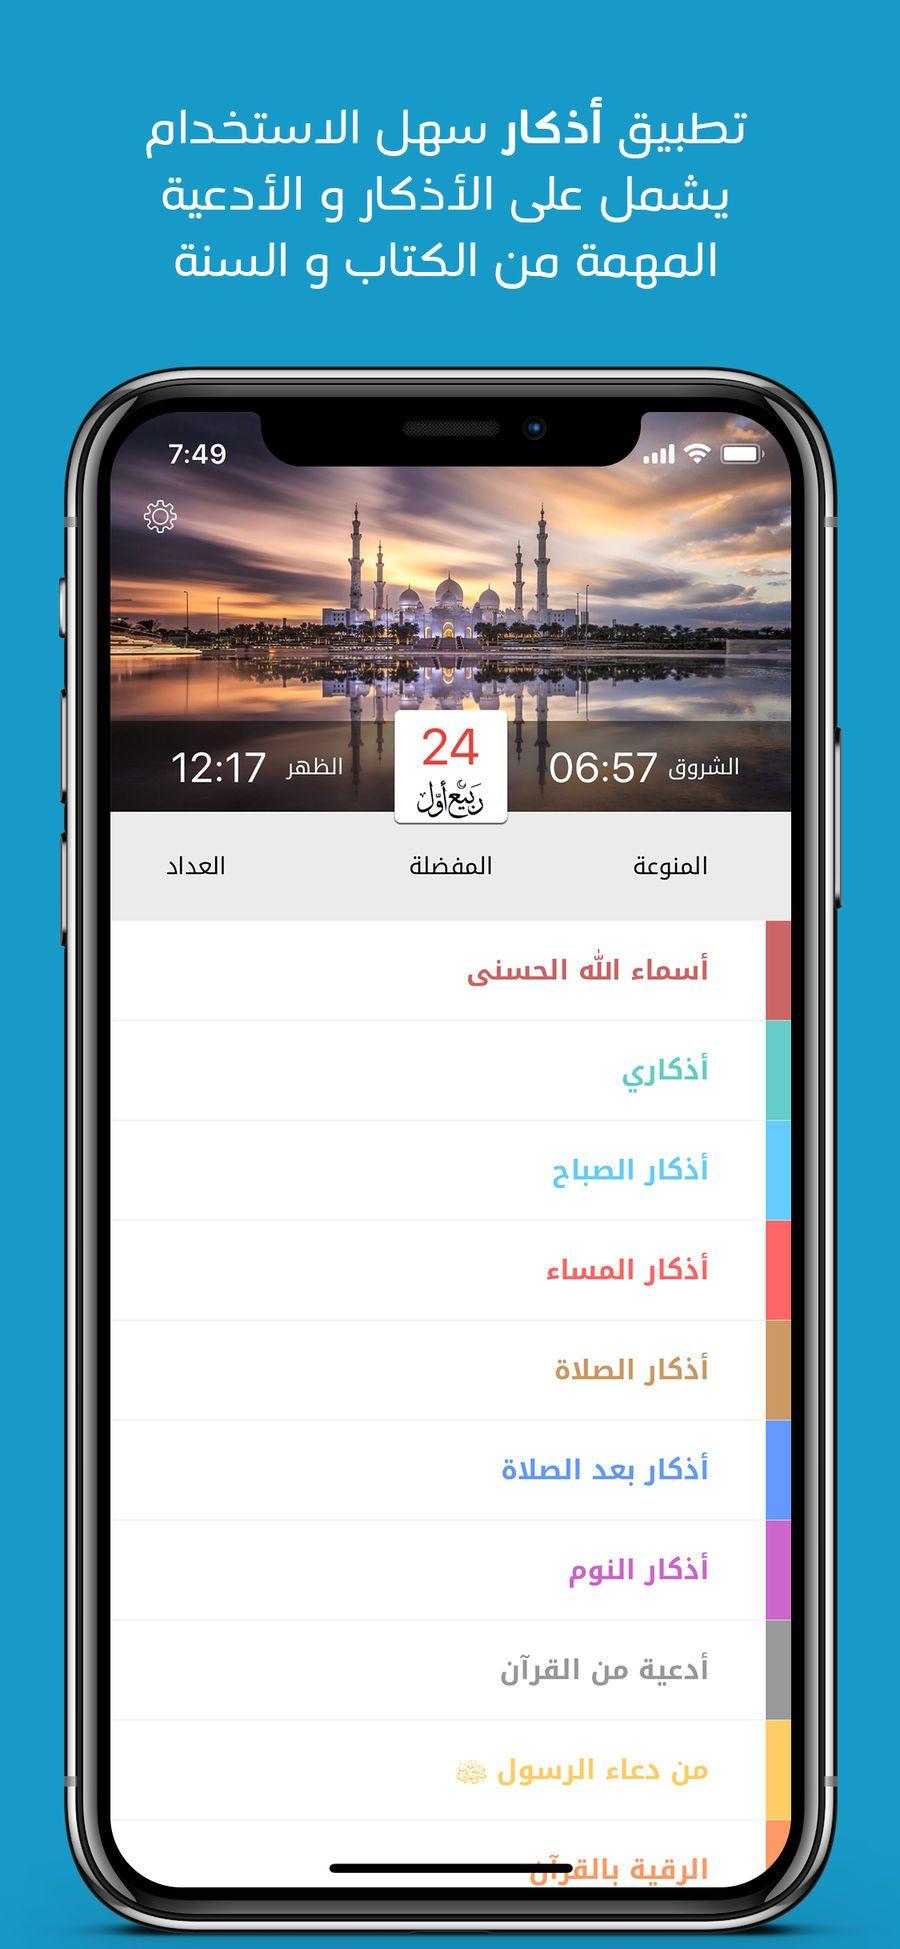 Athkar ????? iosLifestyleappapps App, Iphone, Phone